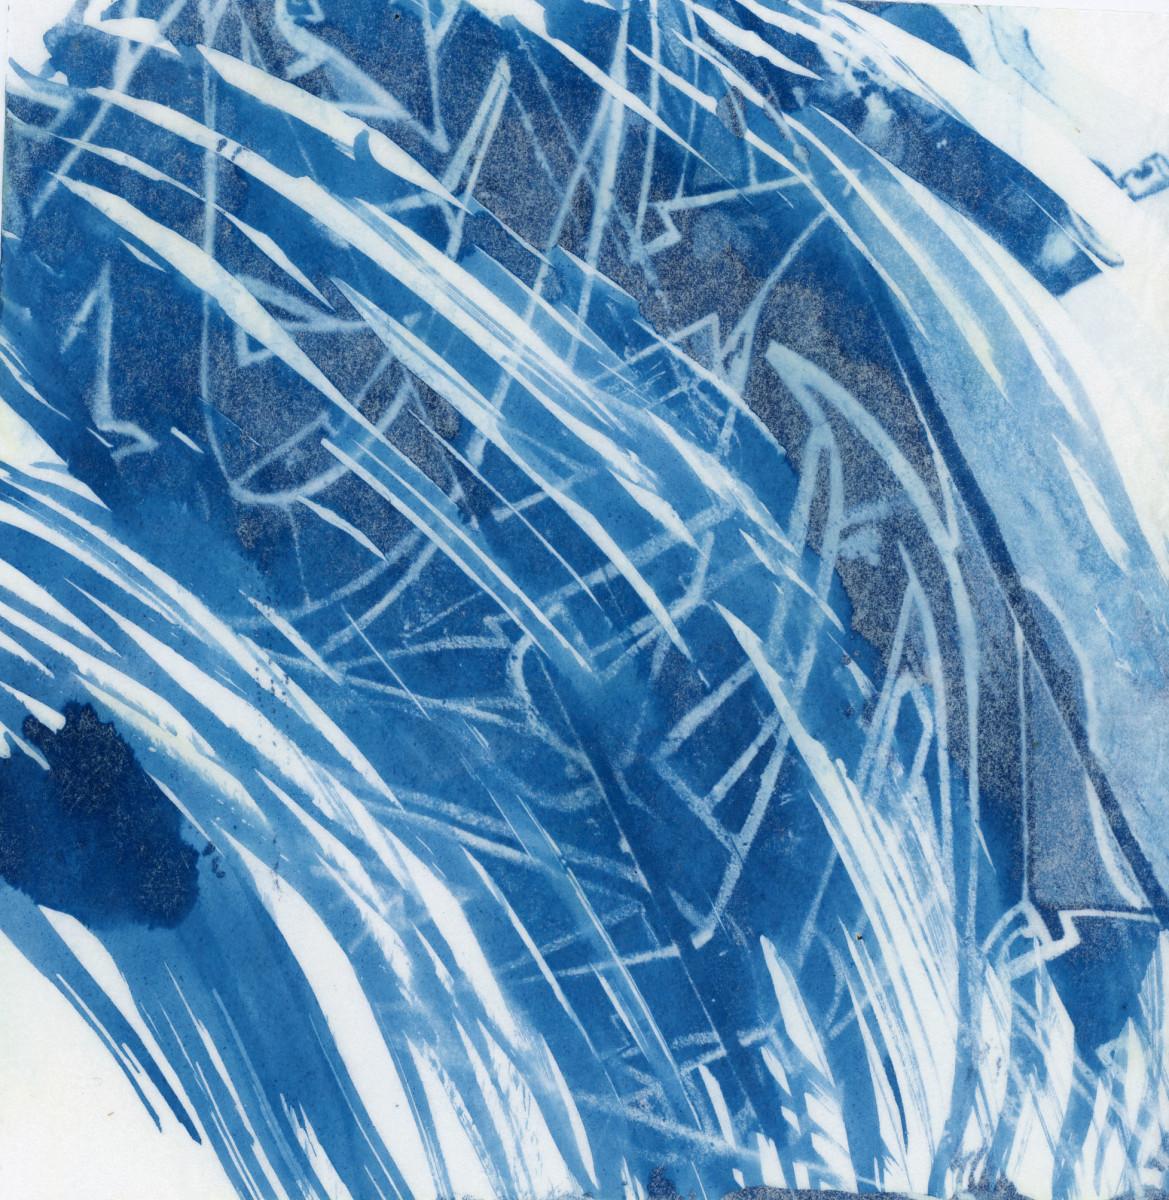 Controlled chaos by Karen Johanson